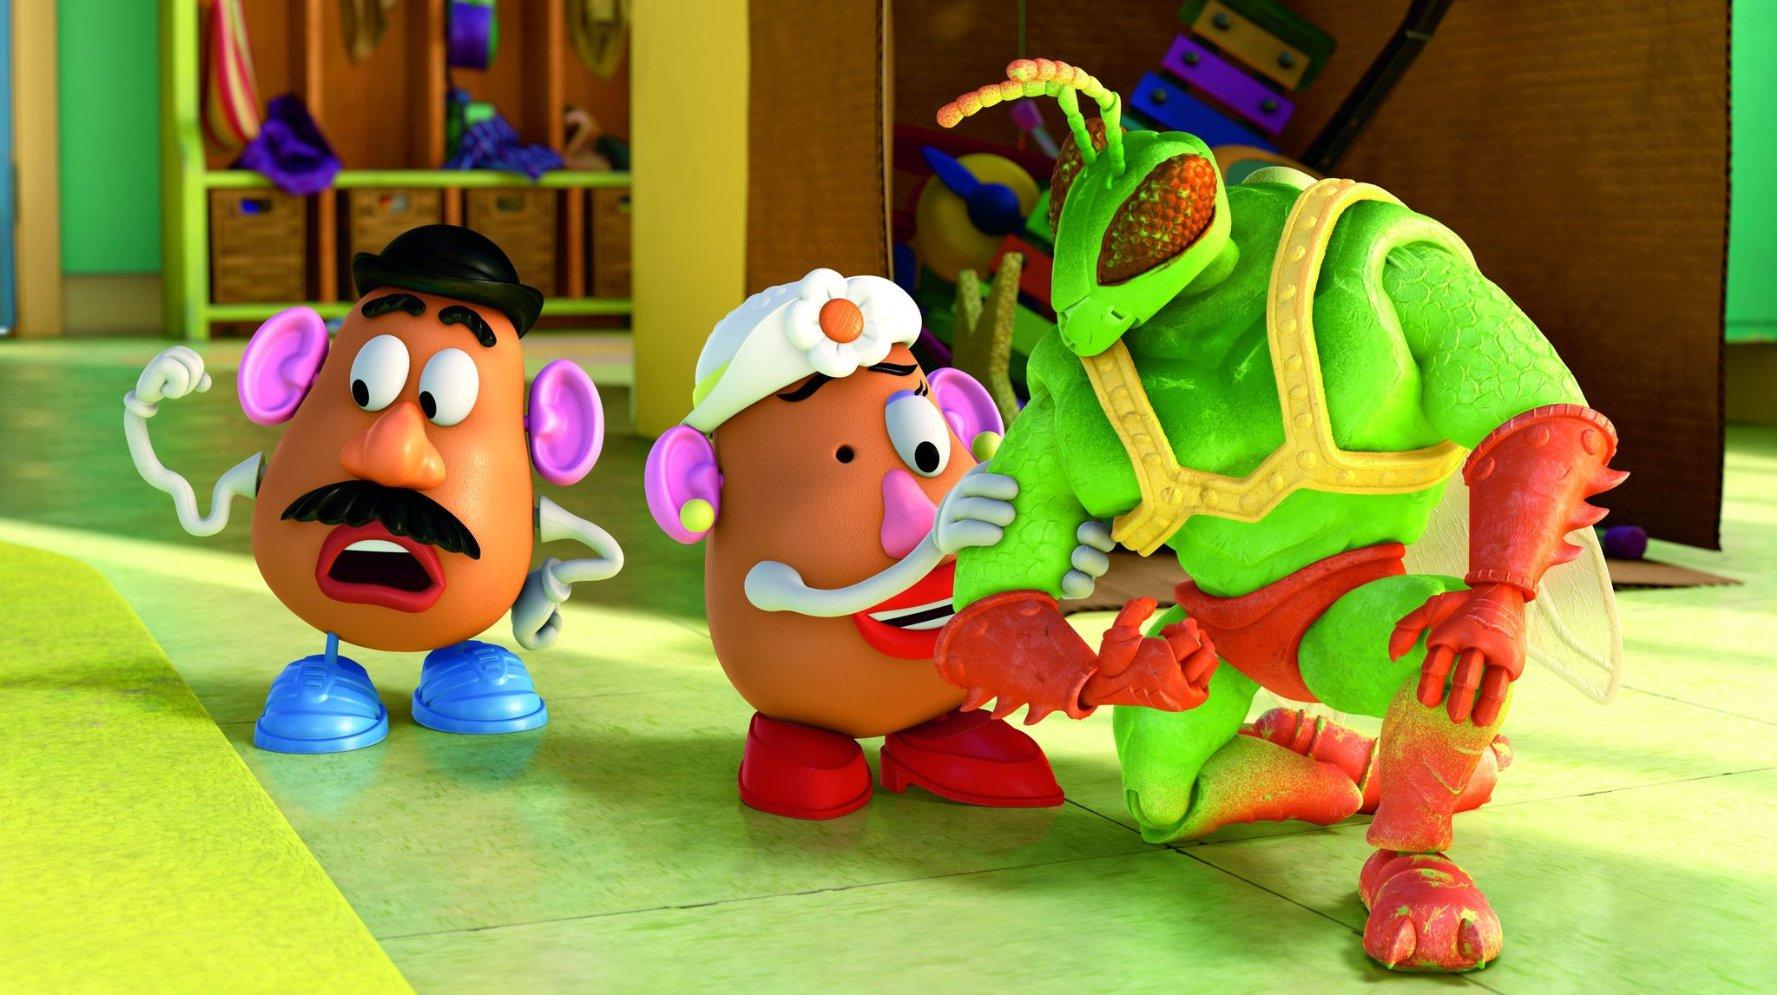 toy story    hd quality    tornado movies